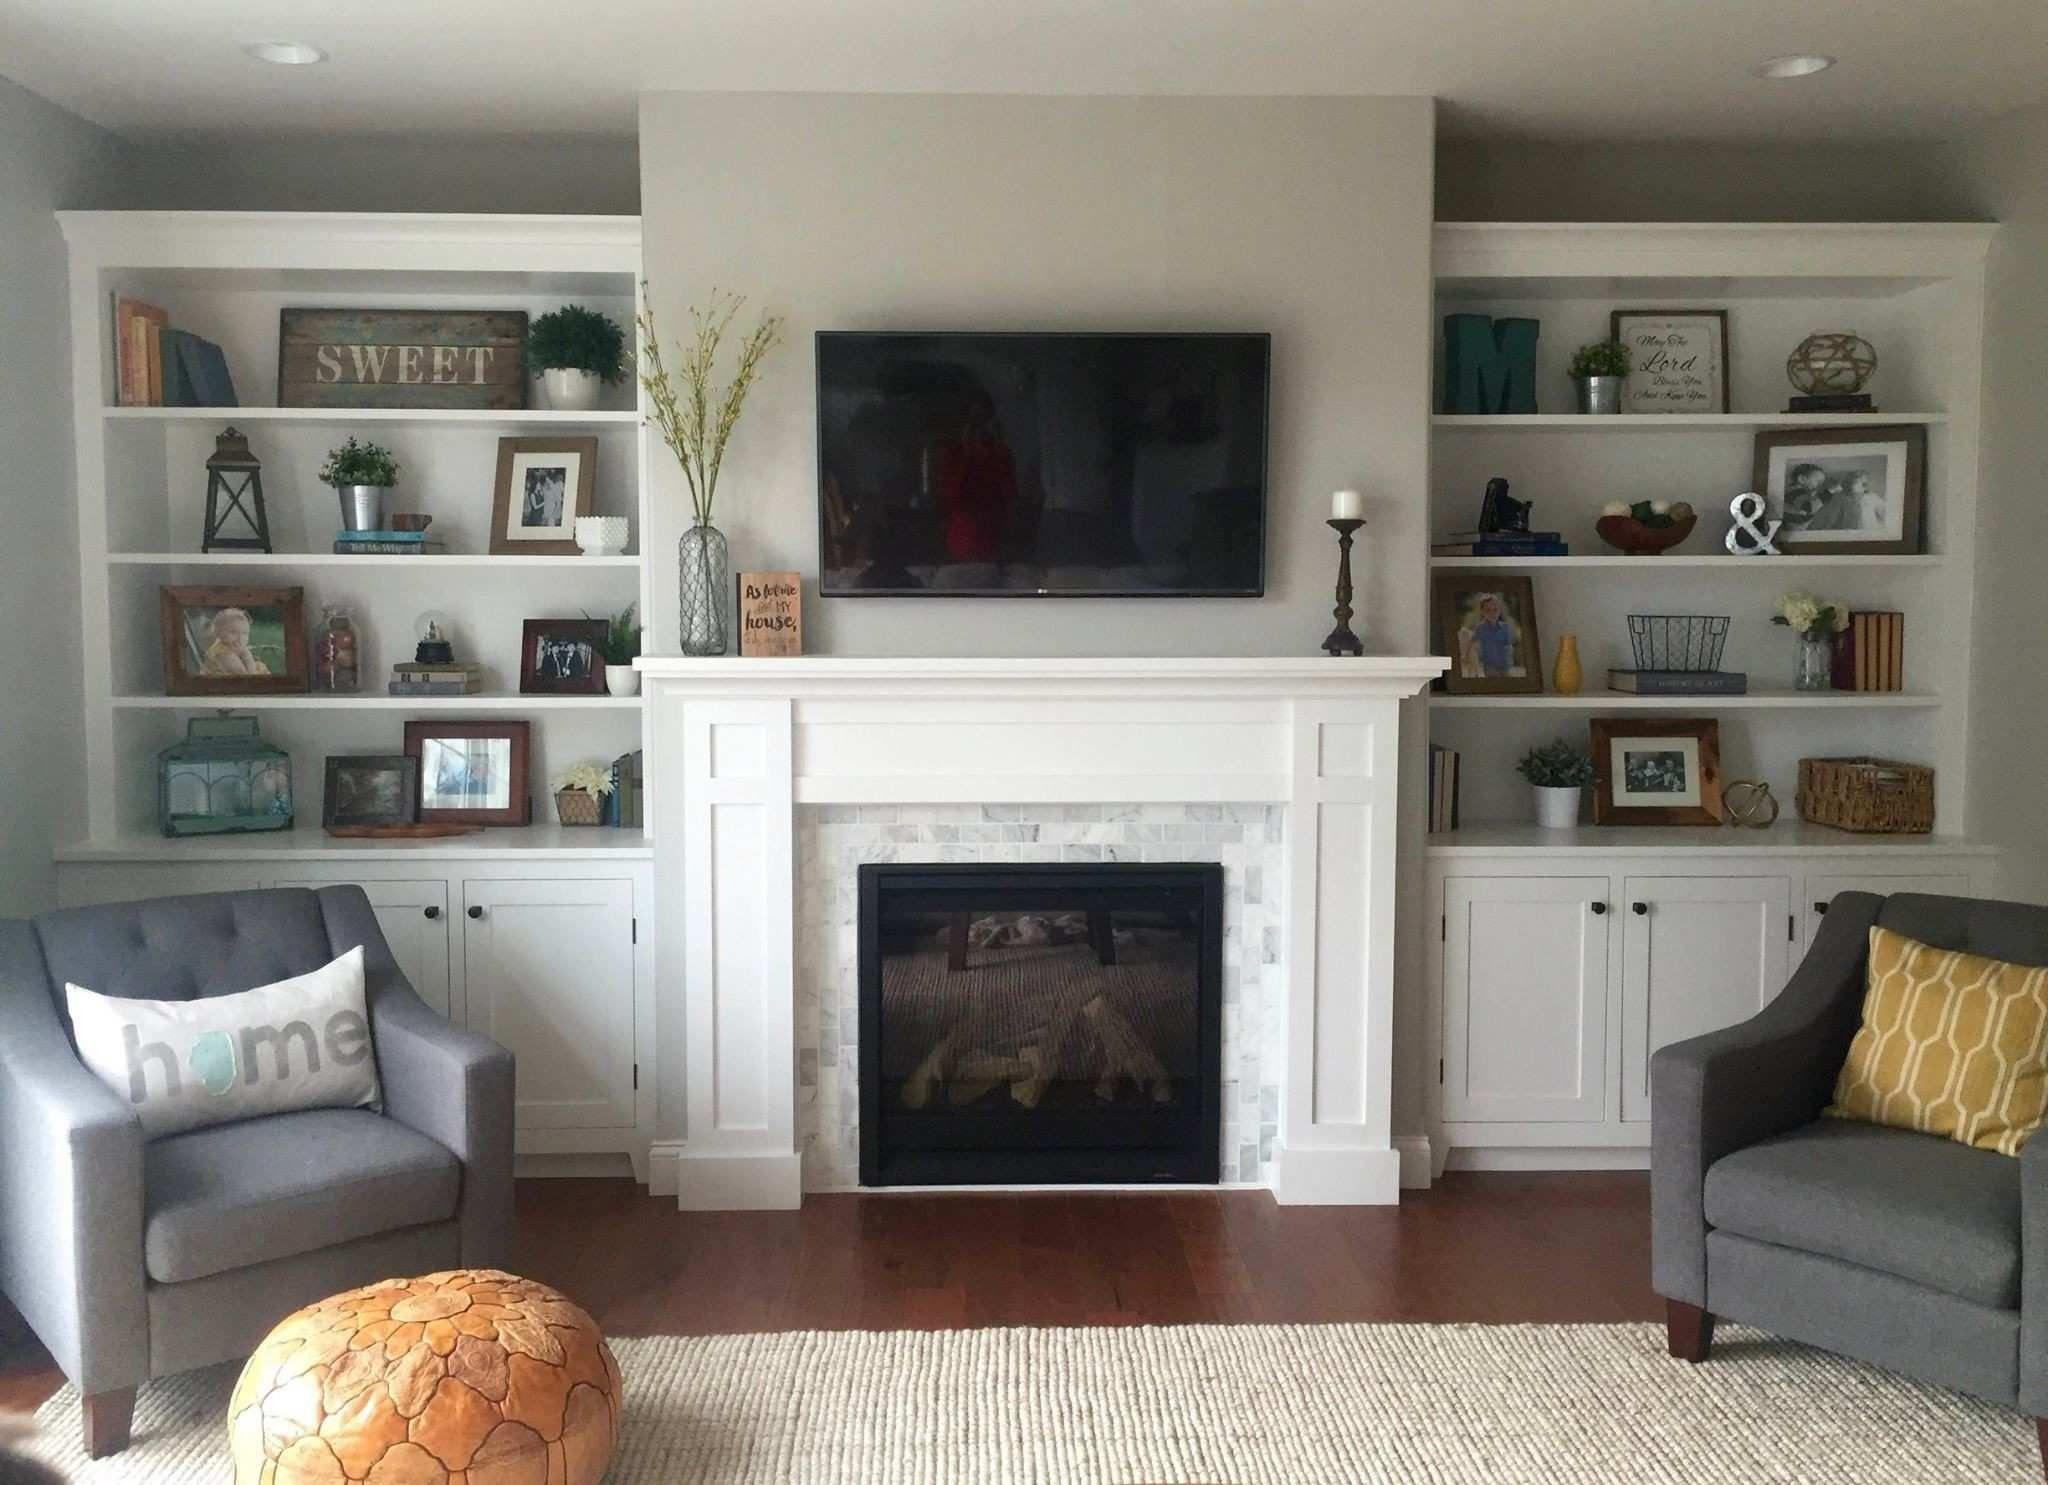 Decorating Ideas For Fireplace Mantel Luxury Built Ins Shiplap Whitewash Brick Fireplace Bookshelf Styling Living Room Built Ins Fireplace Built Ins Living Room With Fireplace